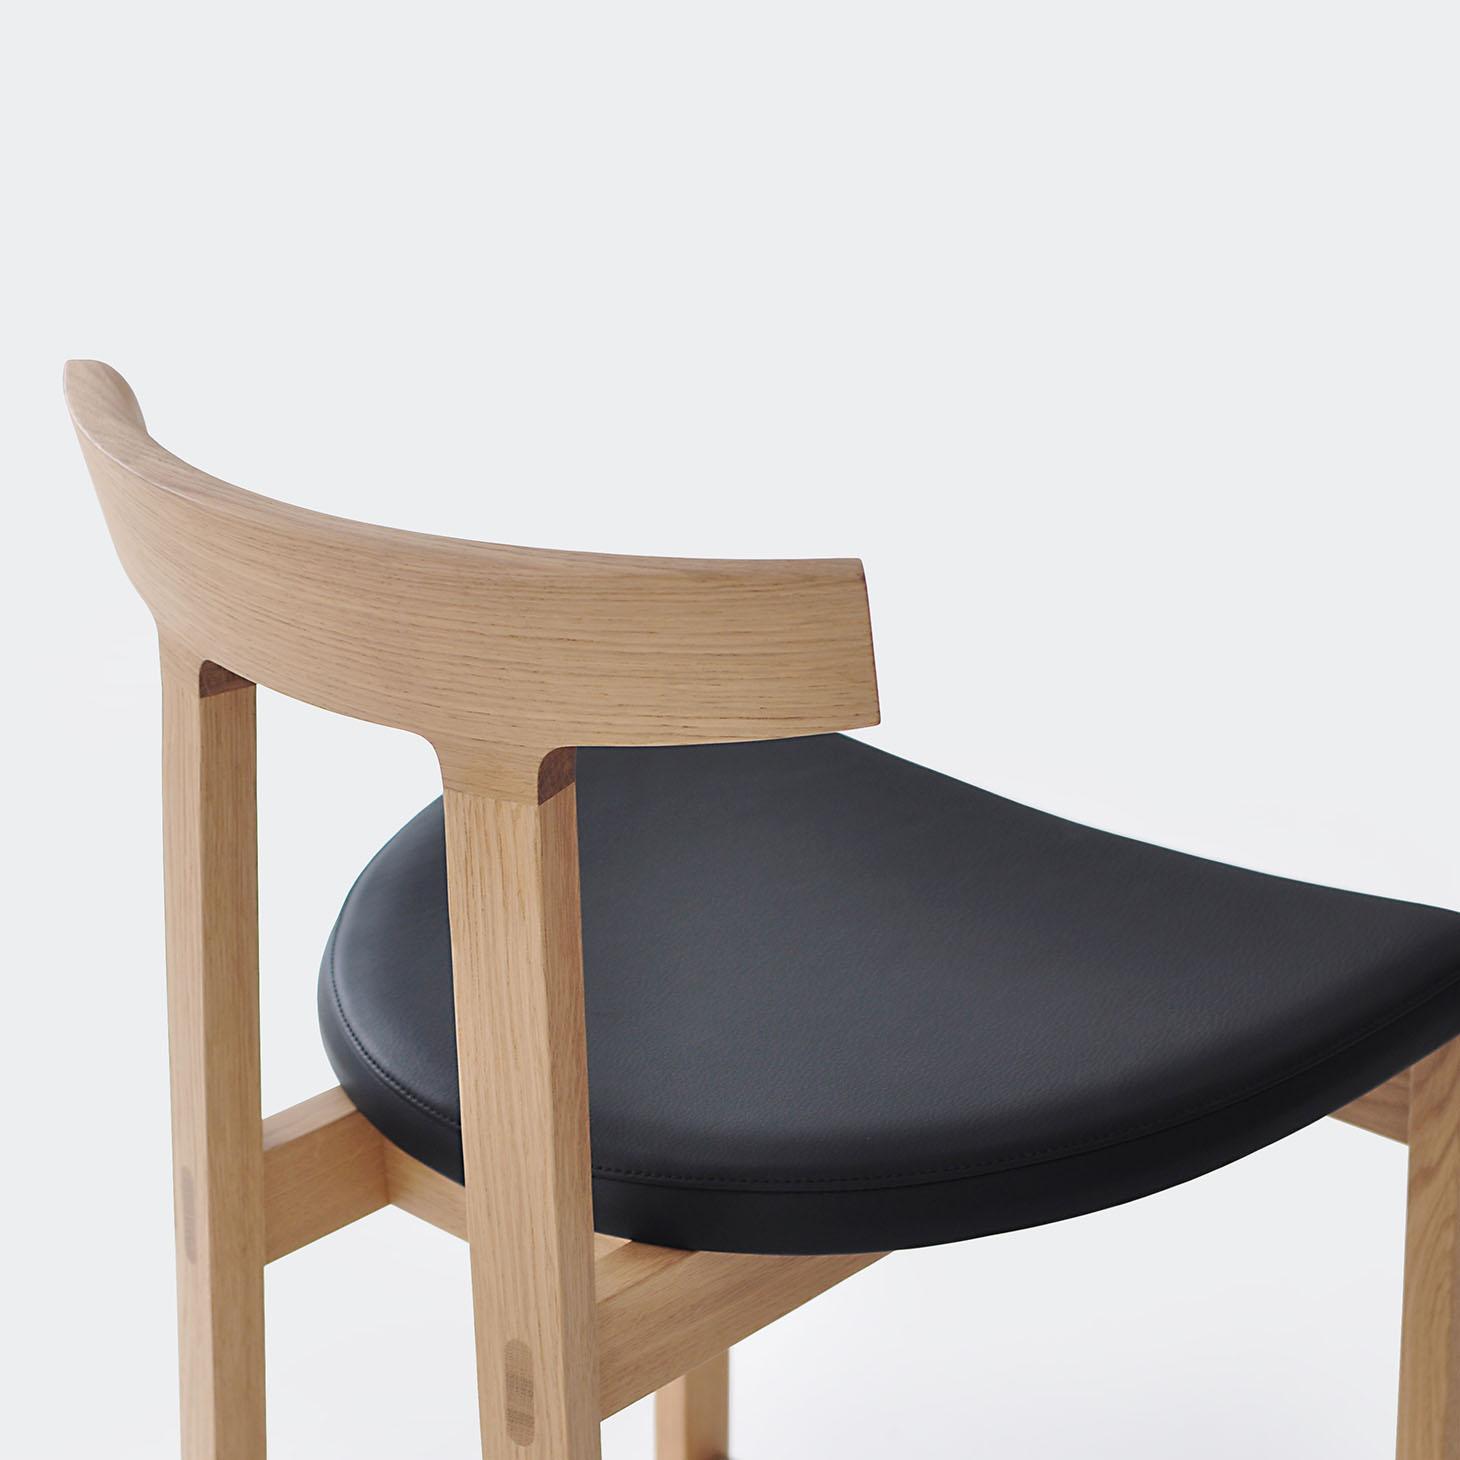 Torii stool